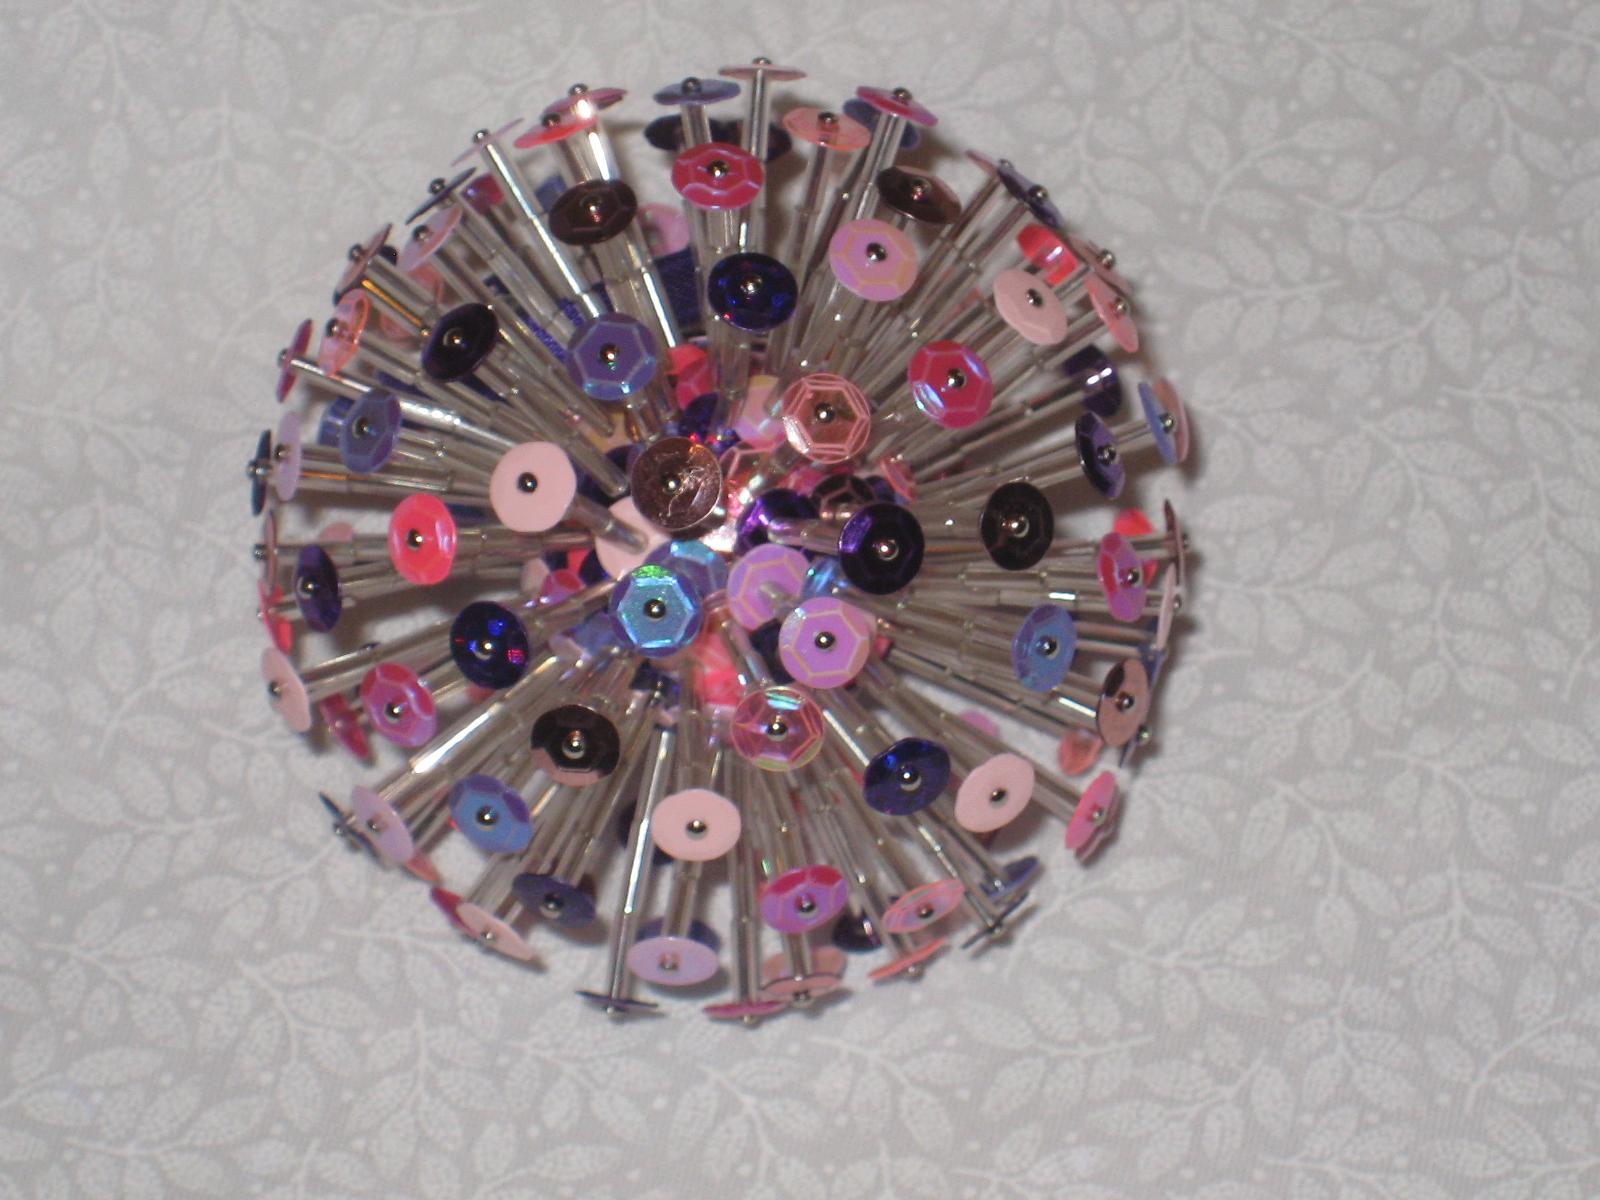 Estas preciosas bolas hechas de lentejuelas.